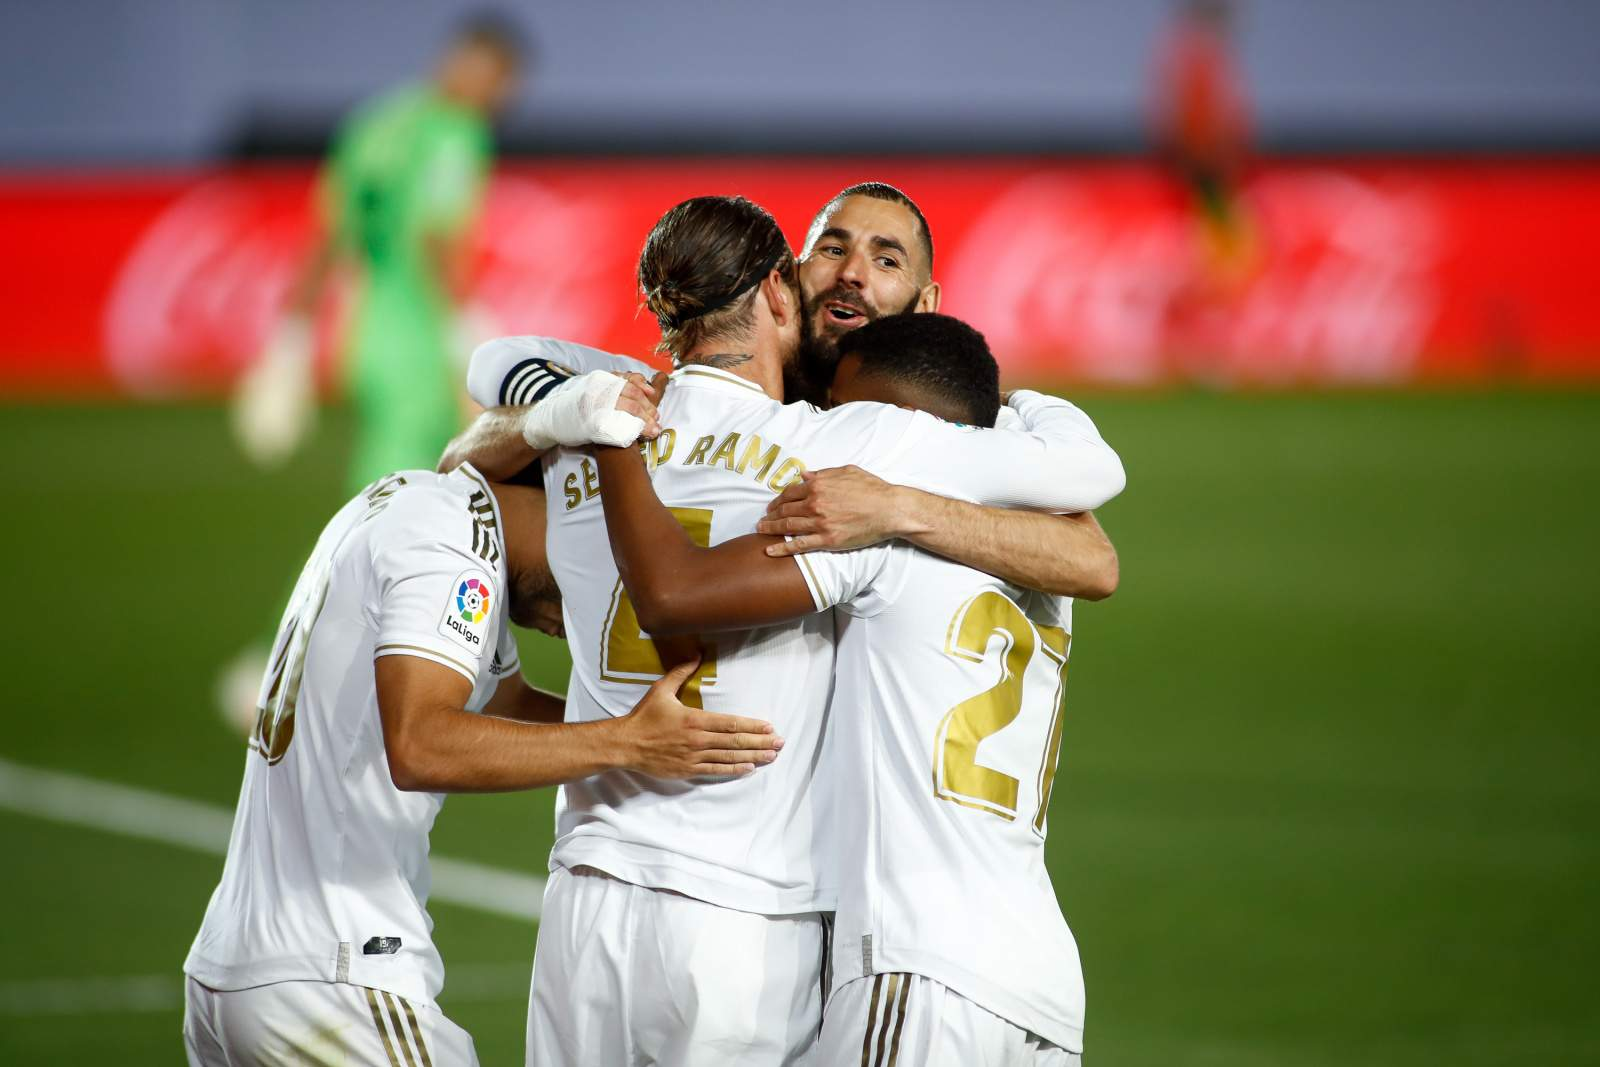 Камавинга решил перейти в «Реал»